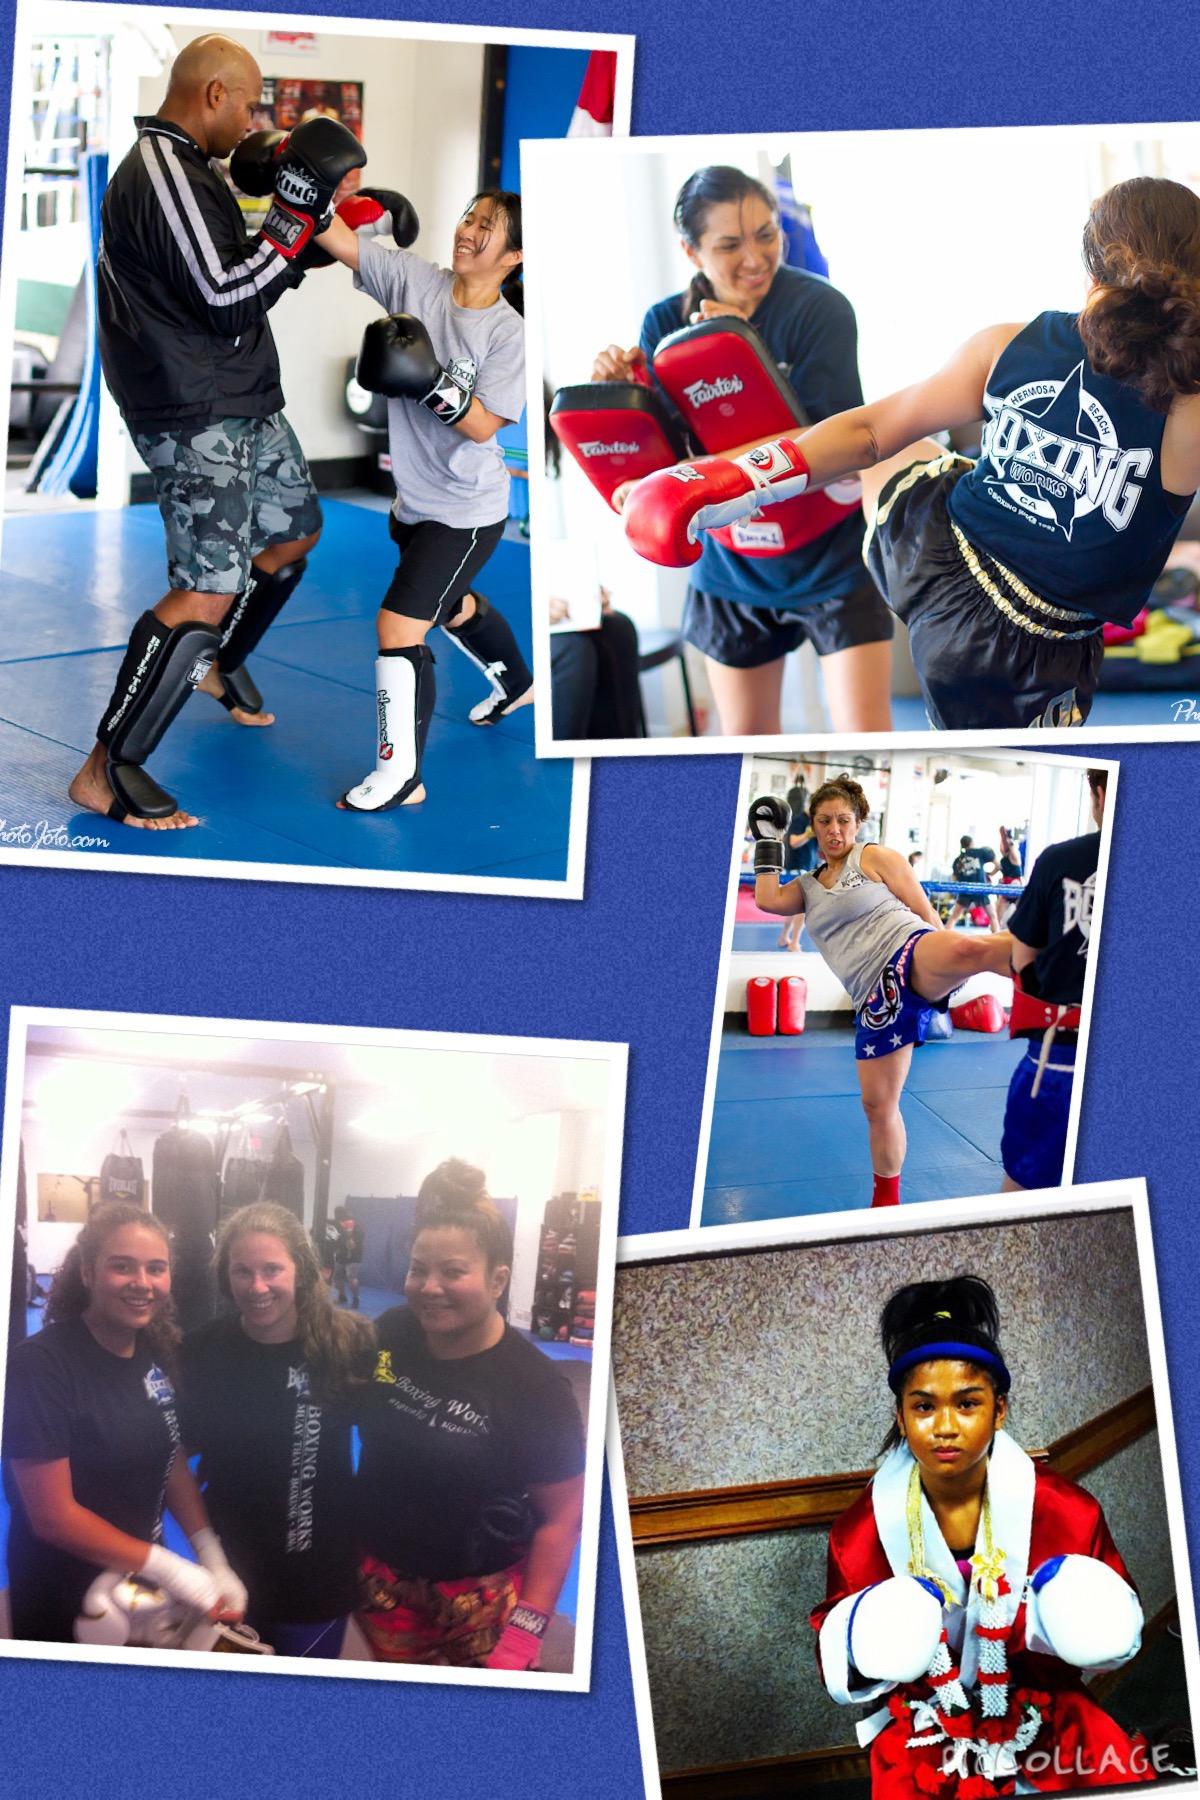 Muay thai boxing women